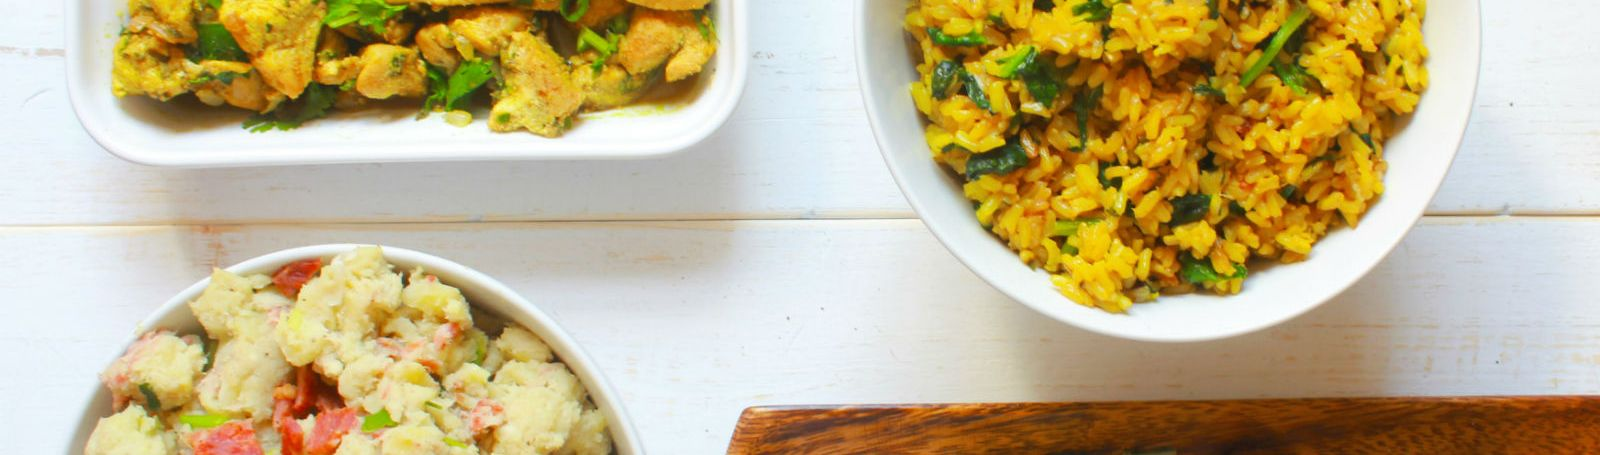 Peckings: A Taste of the Caribbean Free e-Cookbook